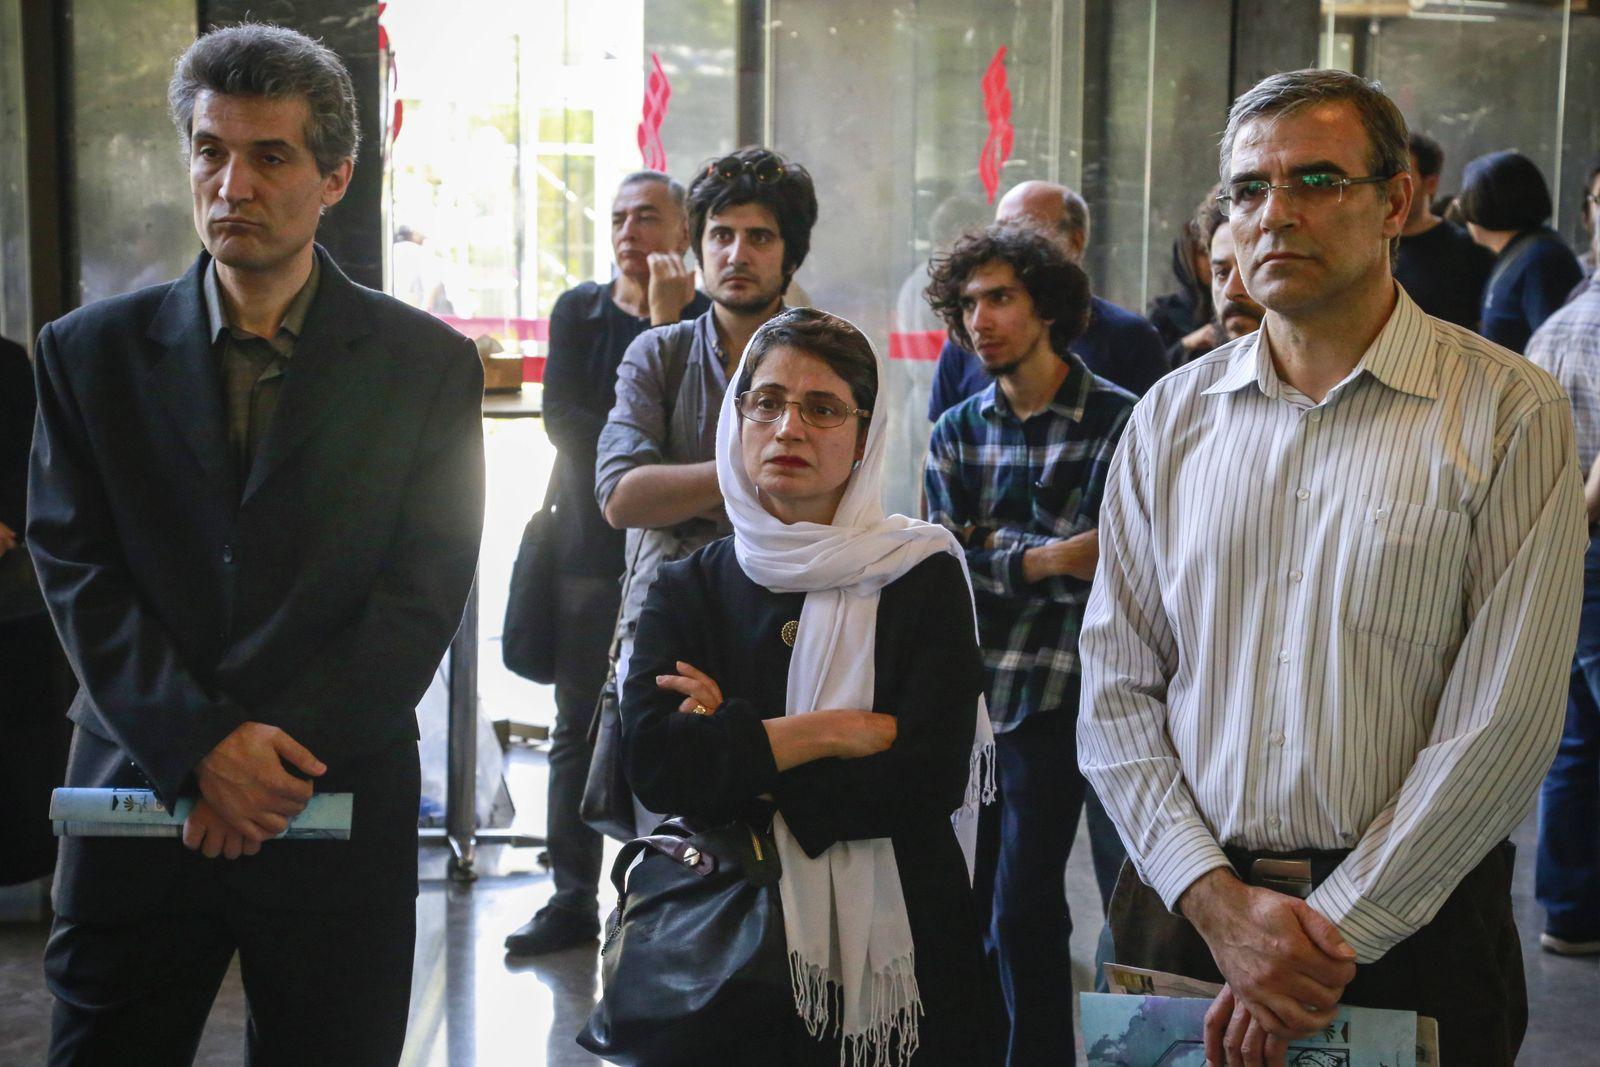 August 1 2017 Tehran Tehran IRAN Iranian Human rights lawyer Nasrin Sotoudeh C attends a